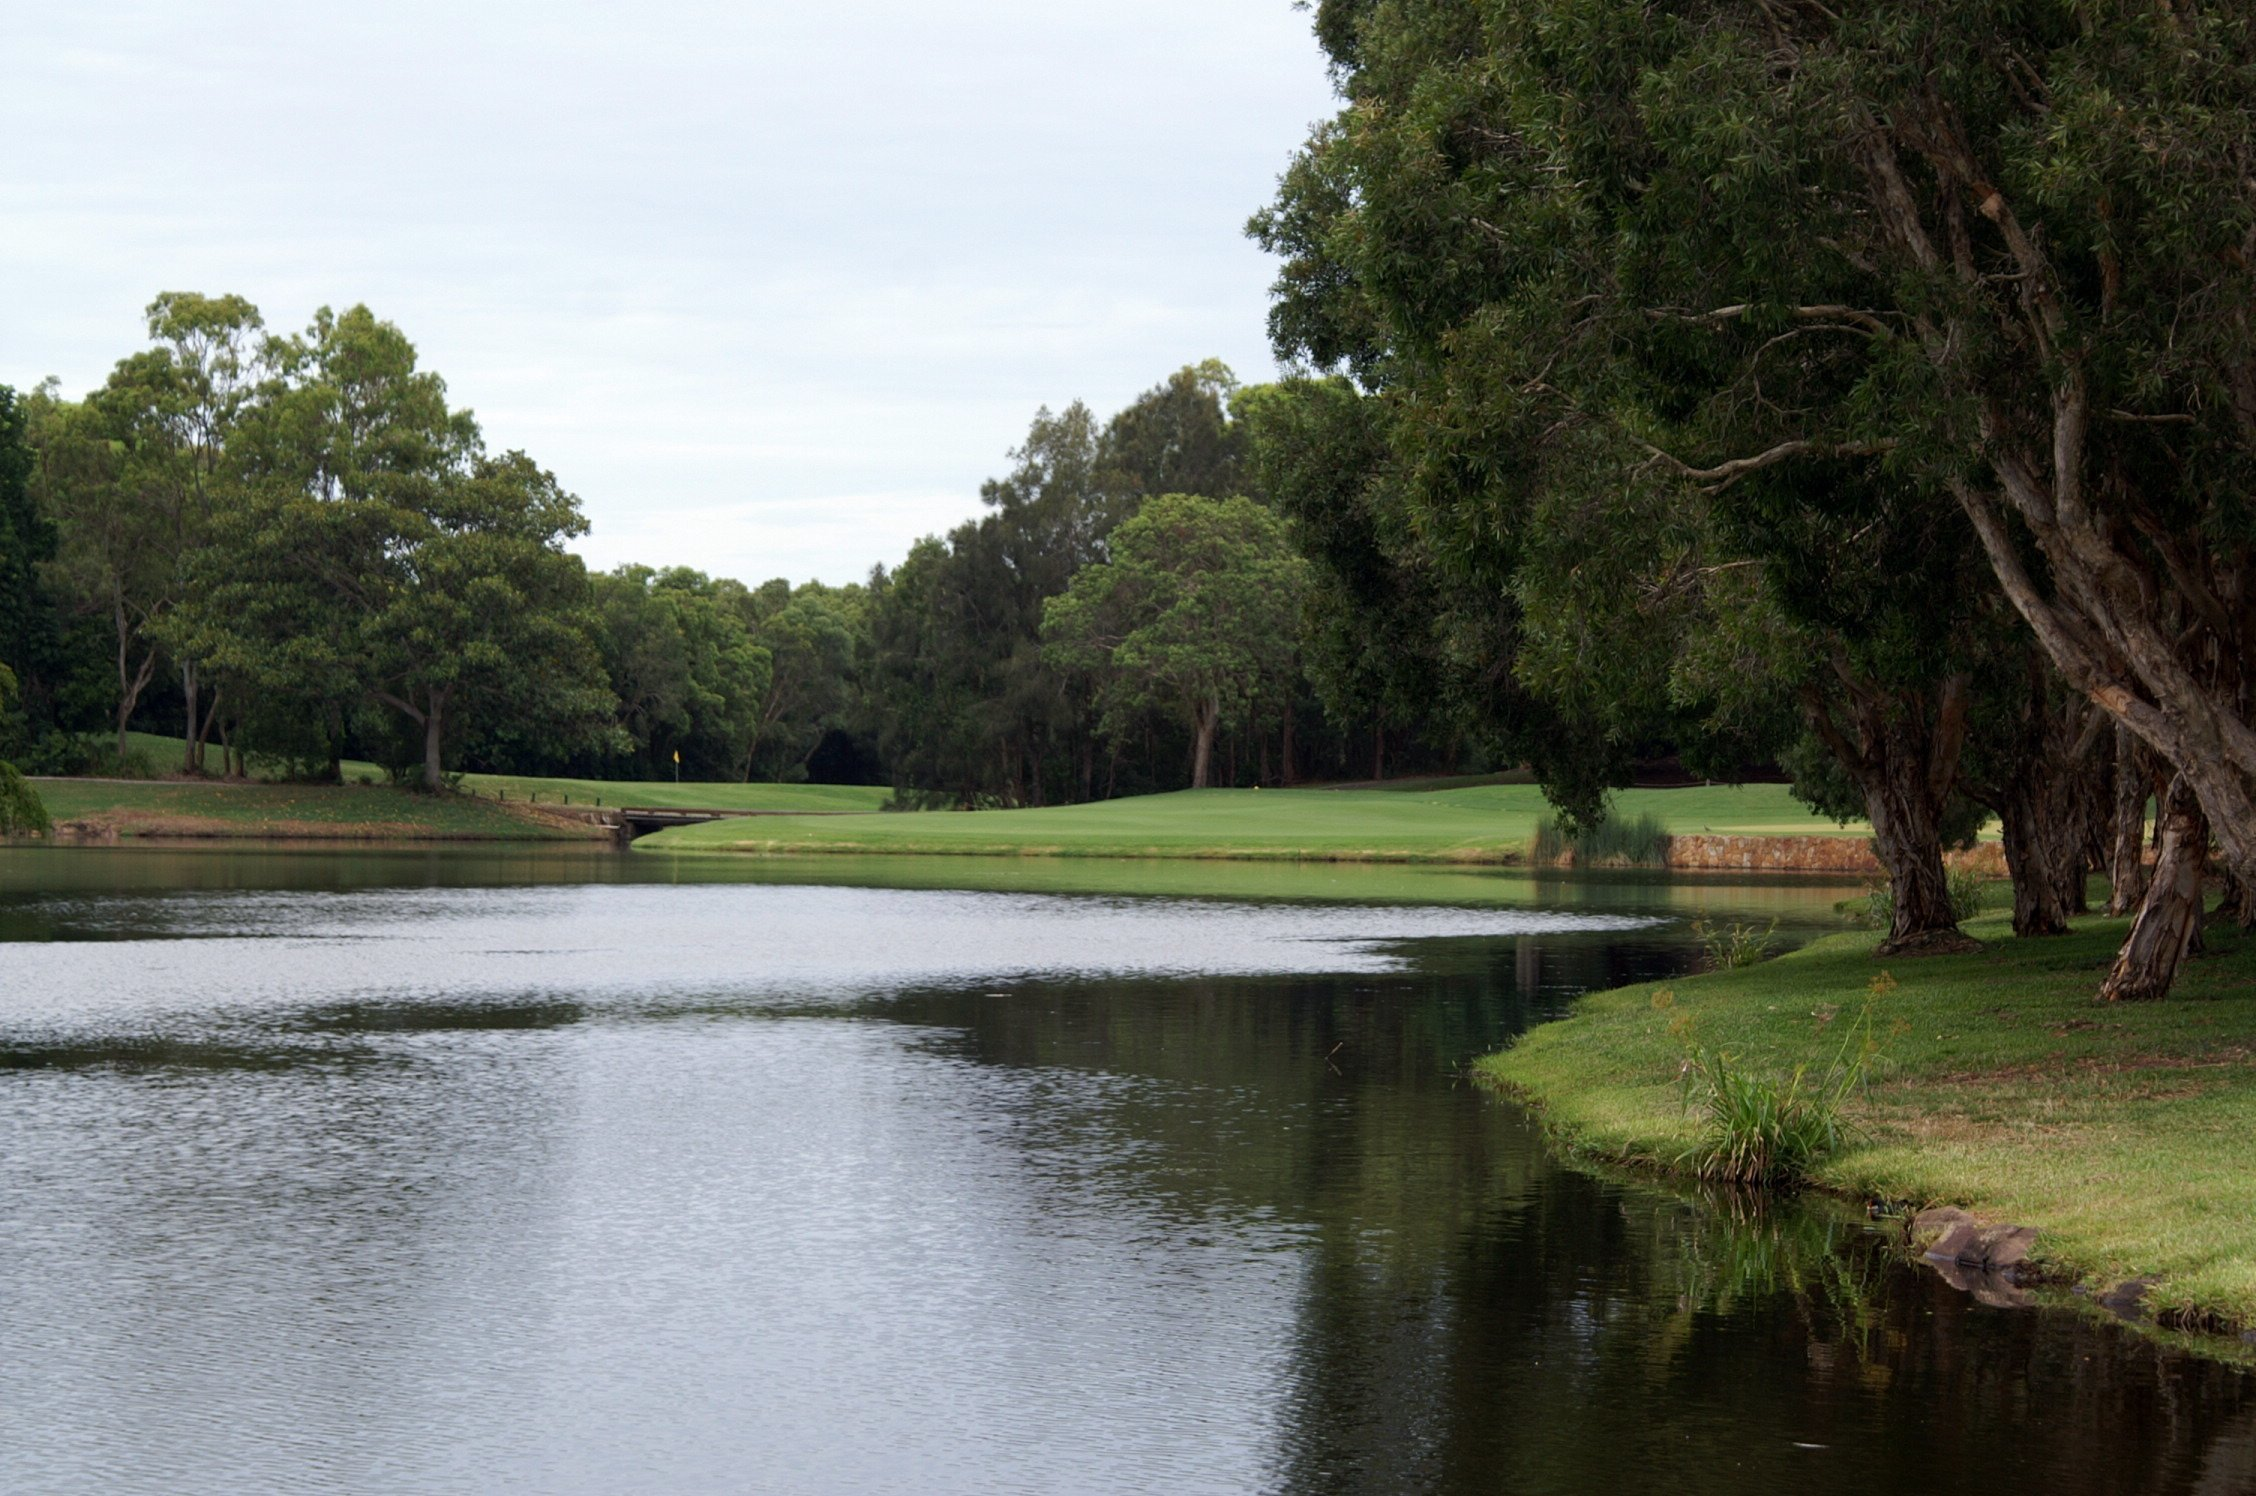 Lake-Golf-Hyatt-Coolum